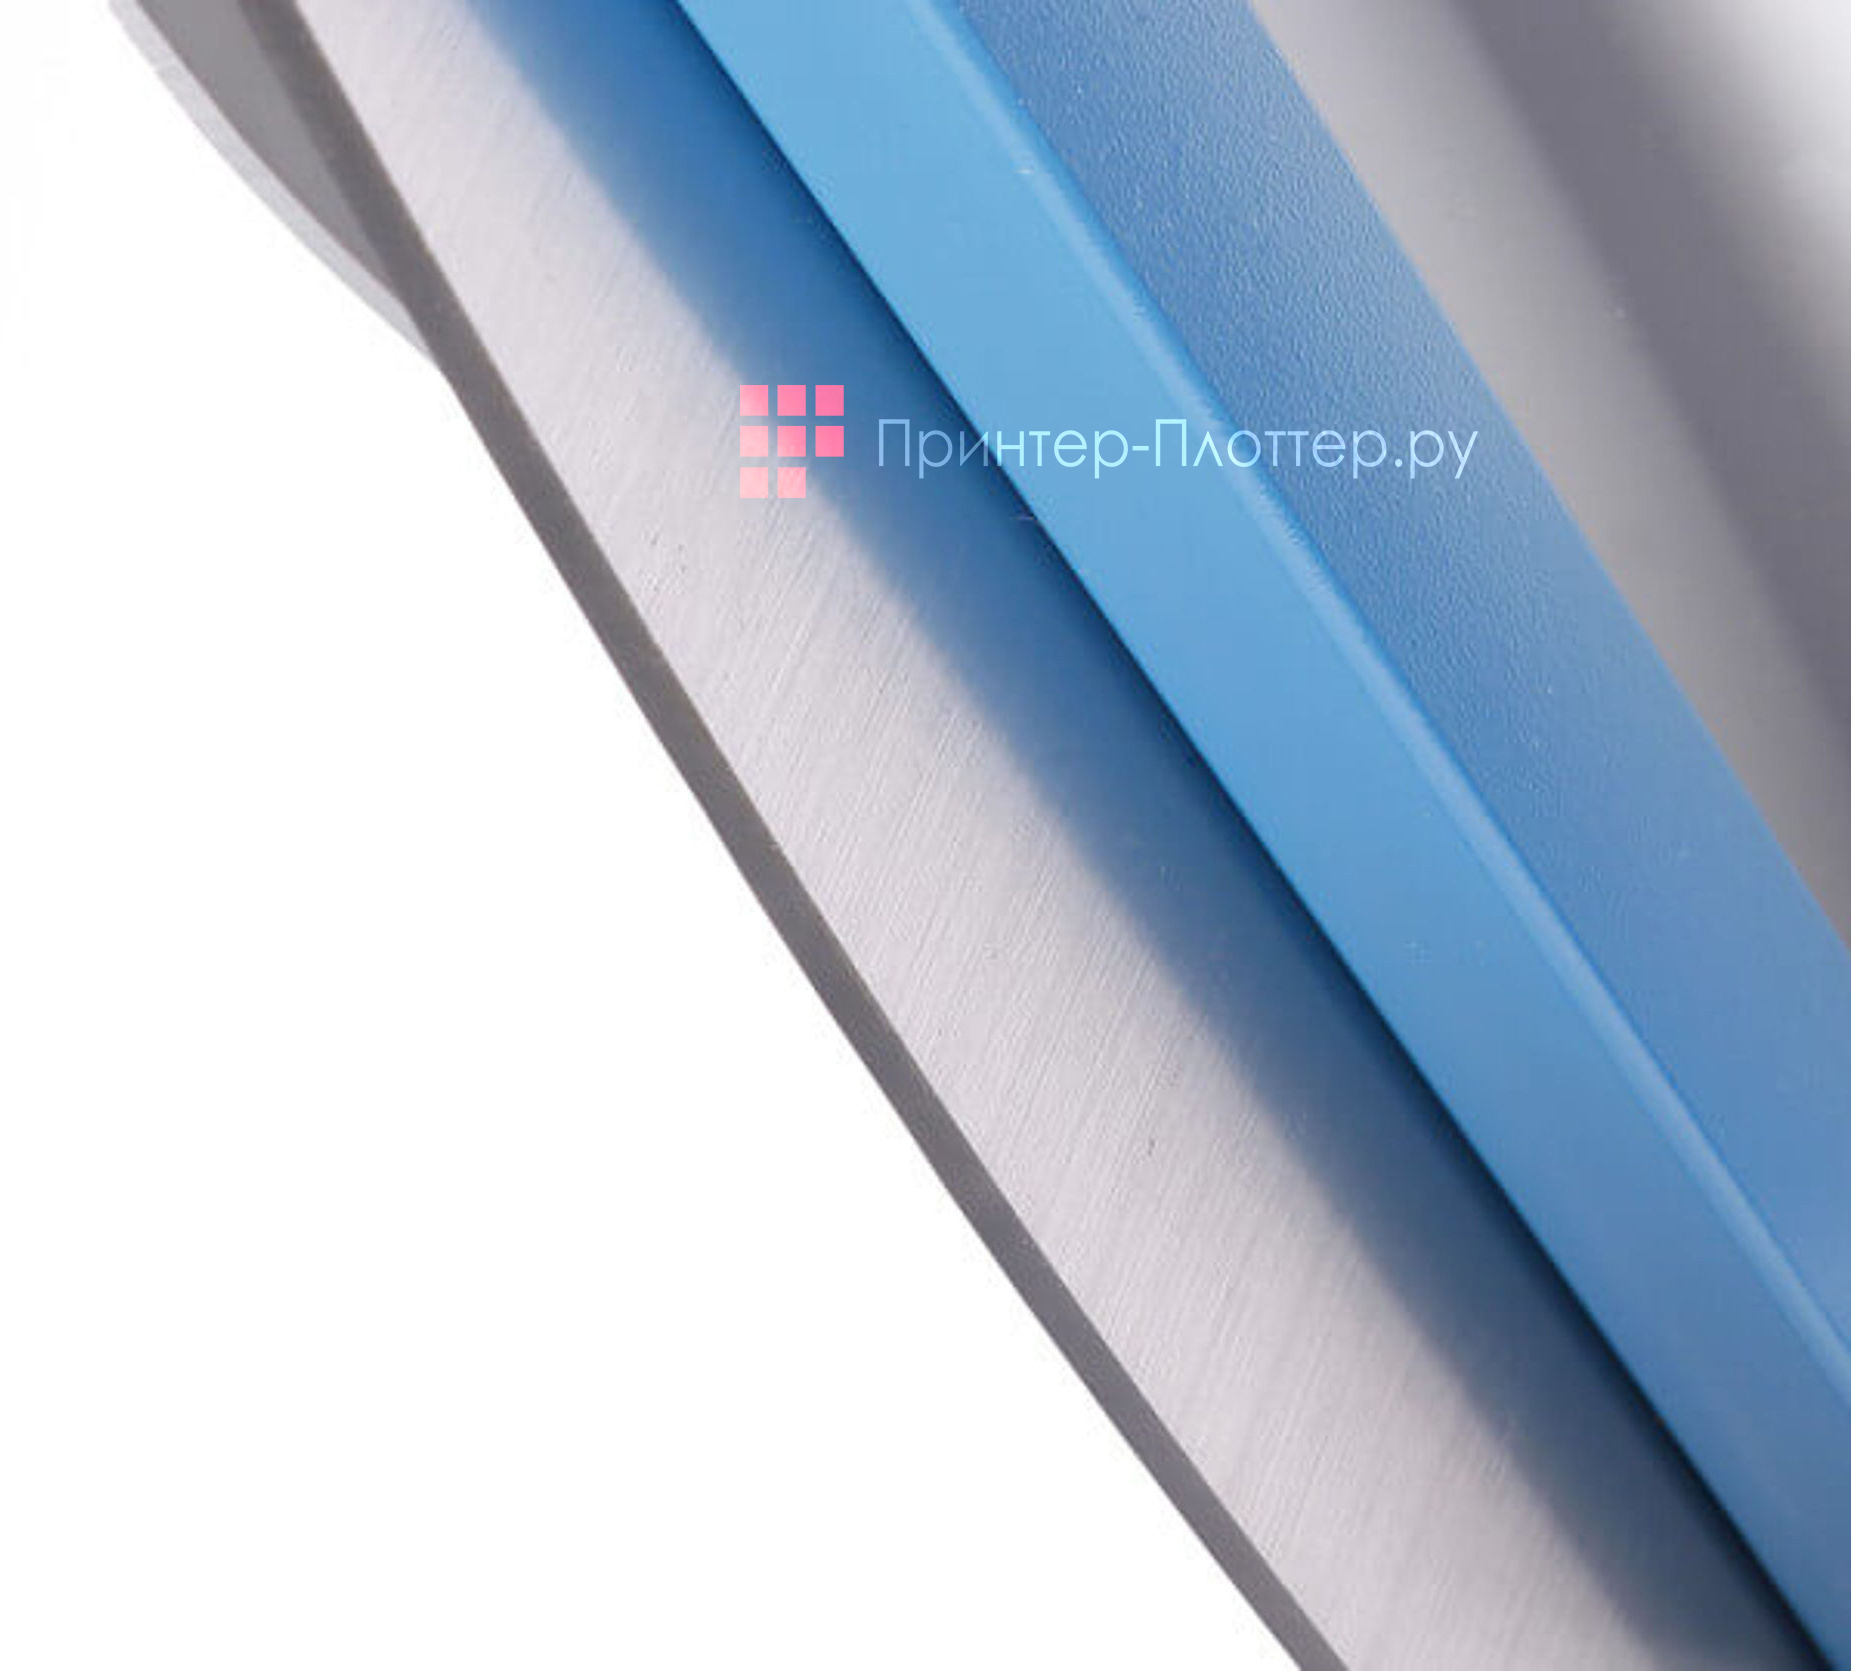 Dahle 561. Нож для материалов